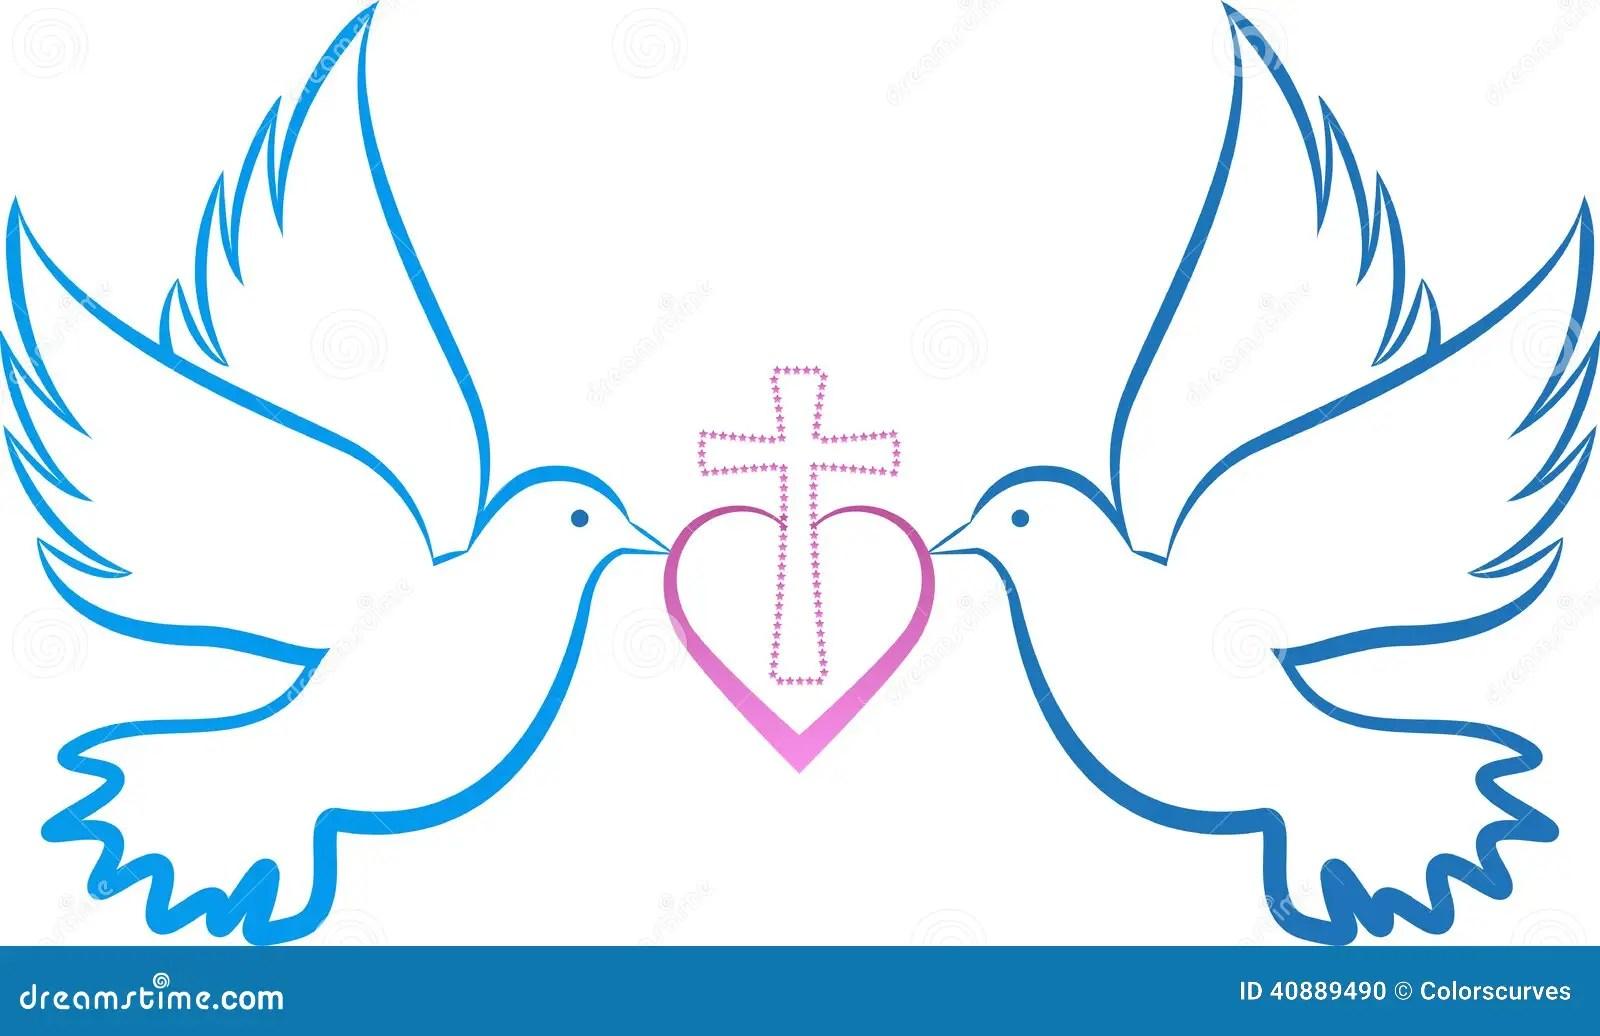 Dove Love Cross Stock Vector. Image Of Ethnic, Feather